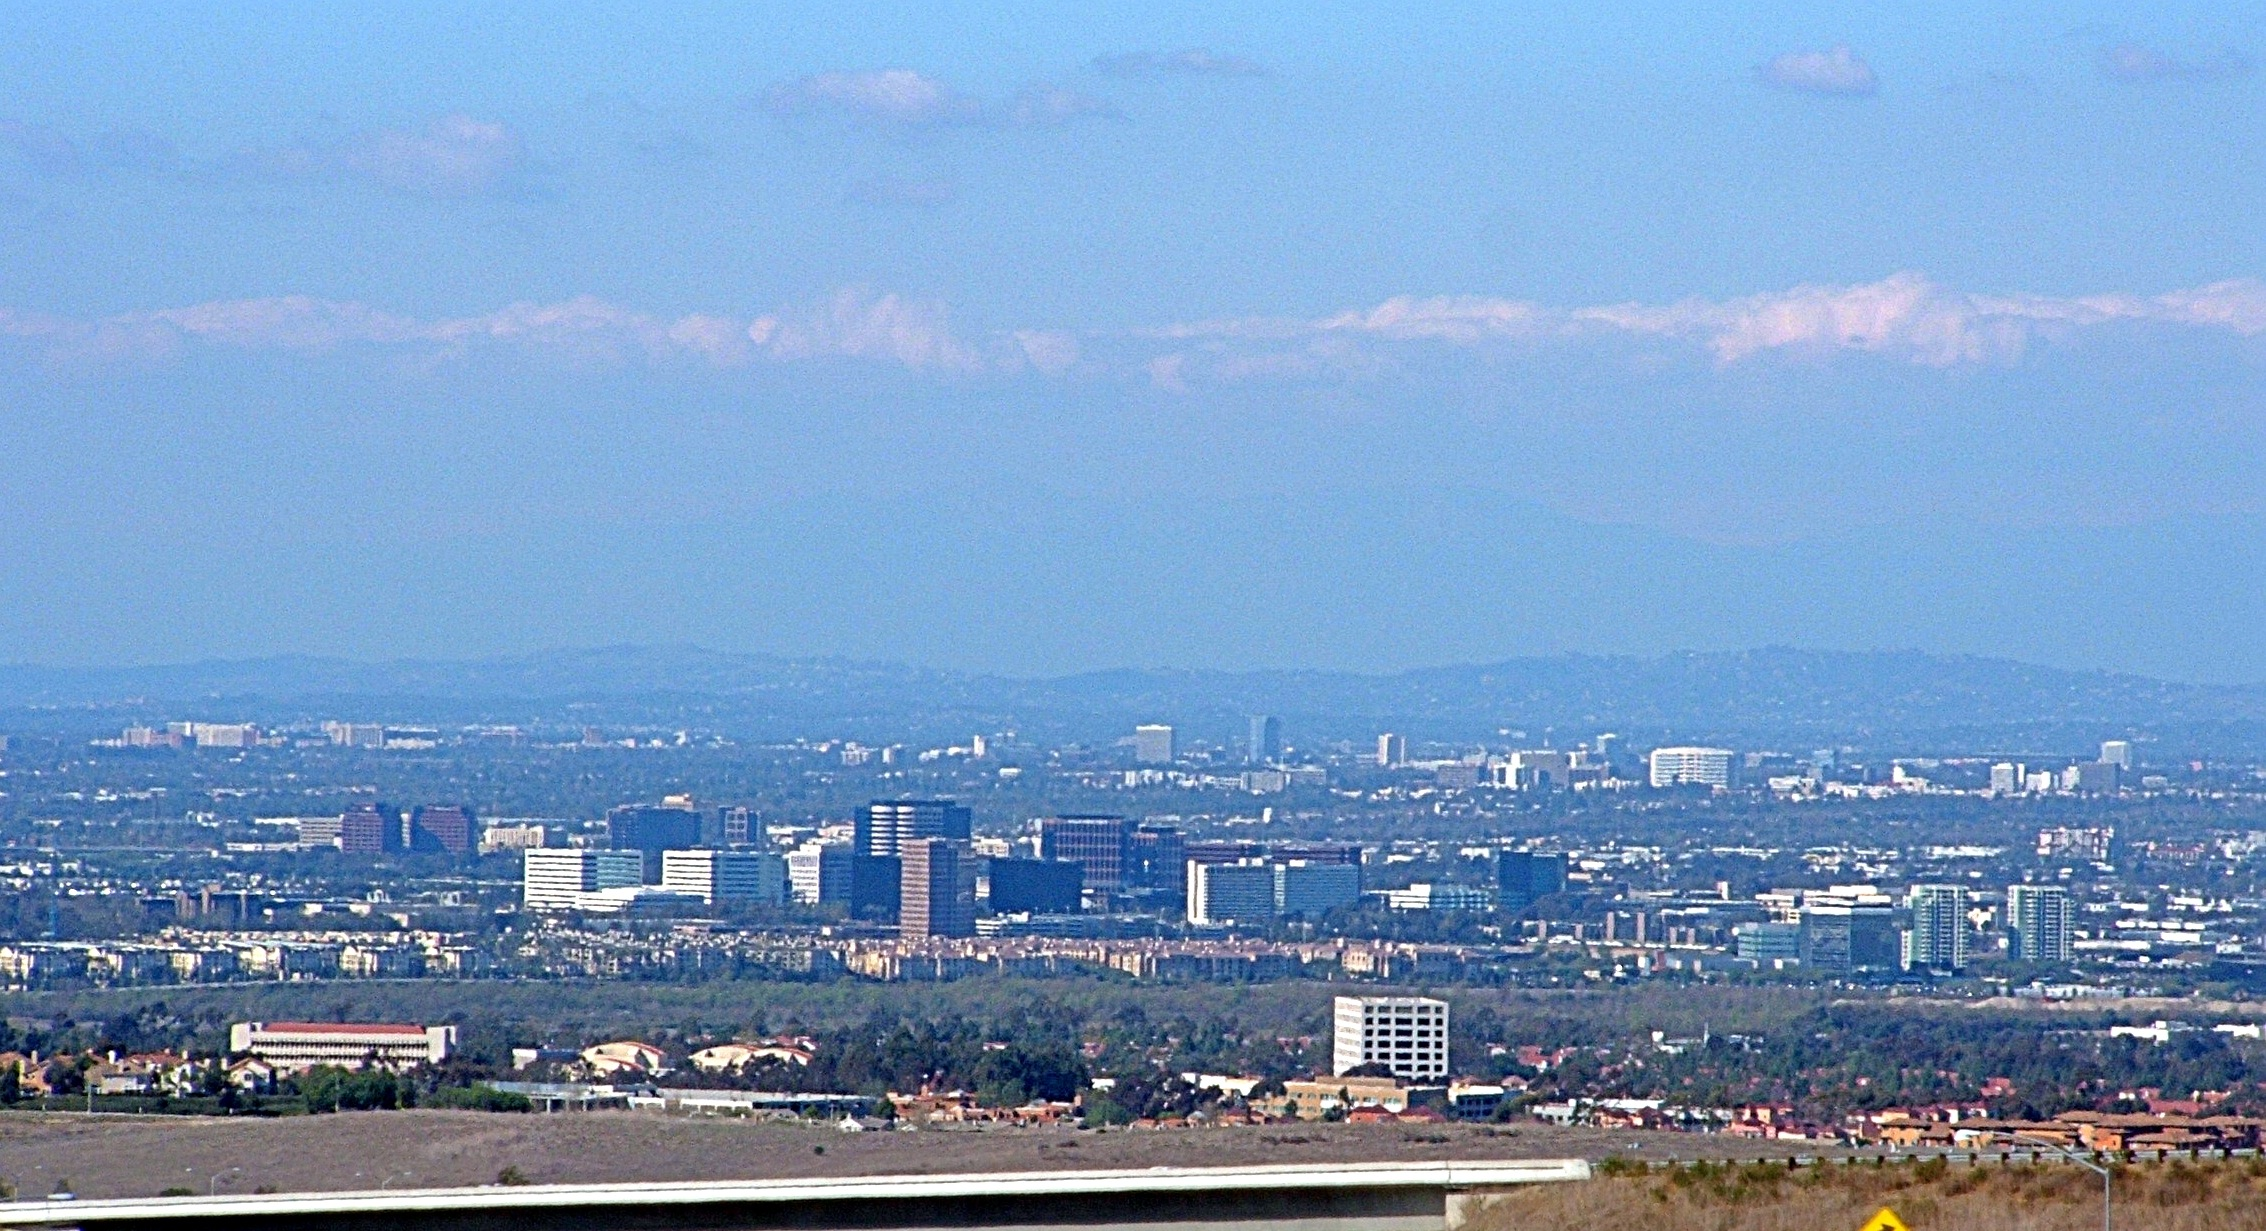 Irvine Salvage Yards, CA